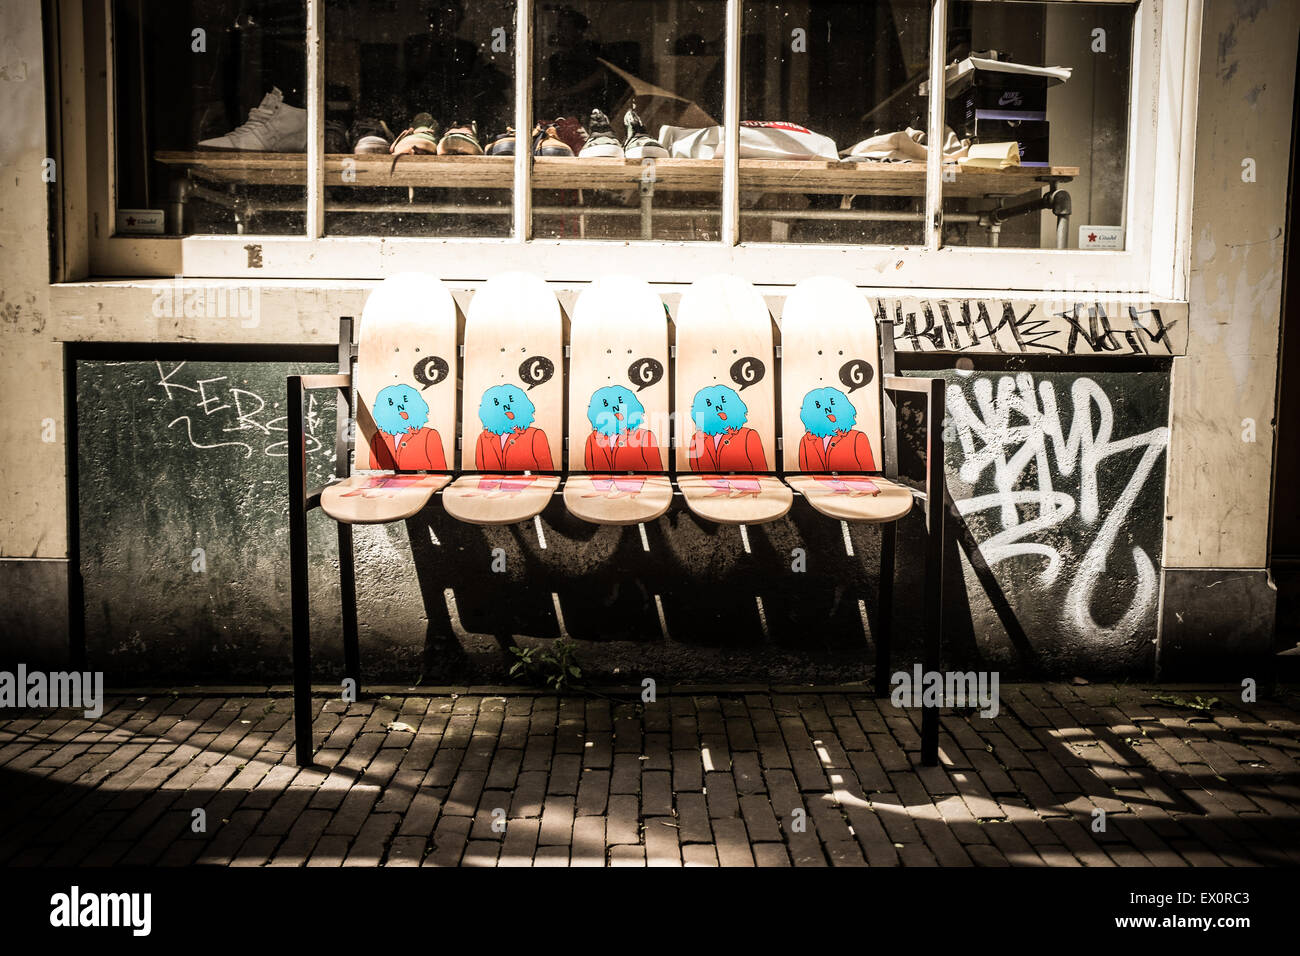 skateboard bank in amsterdam stockbild - Skateboard Bank Beine